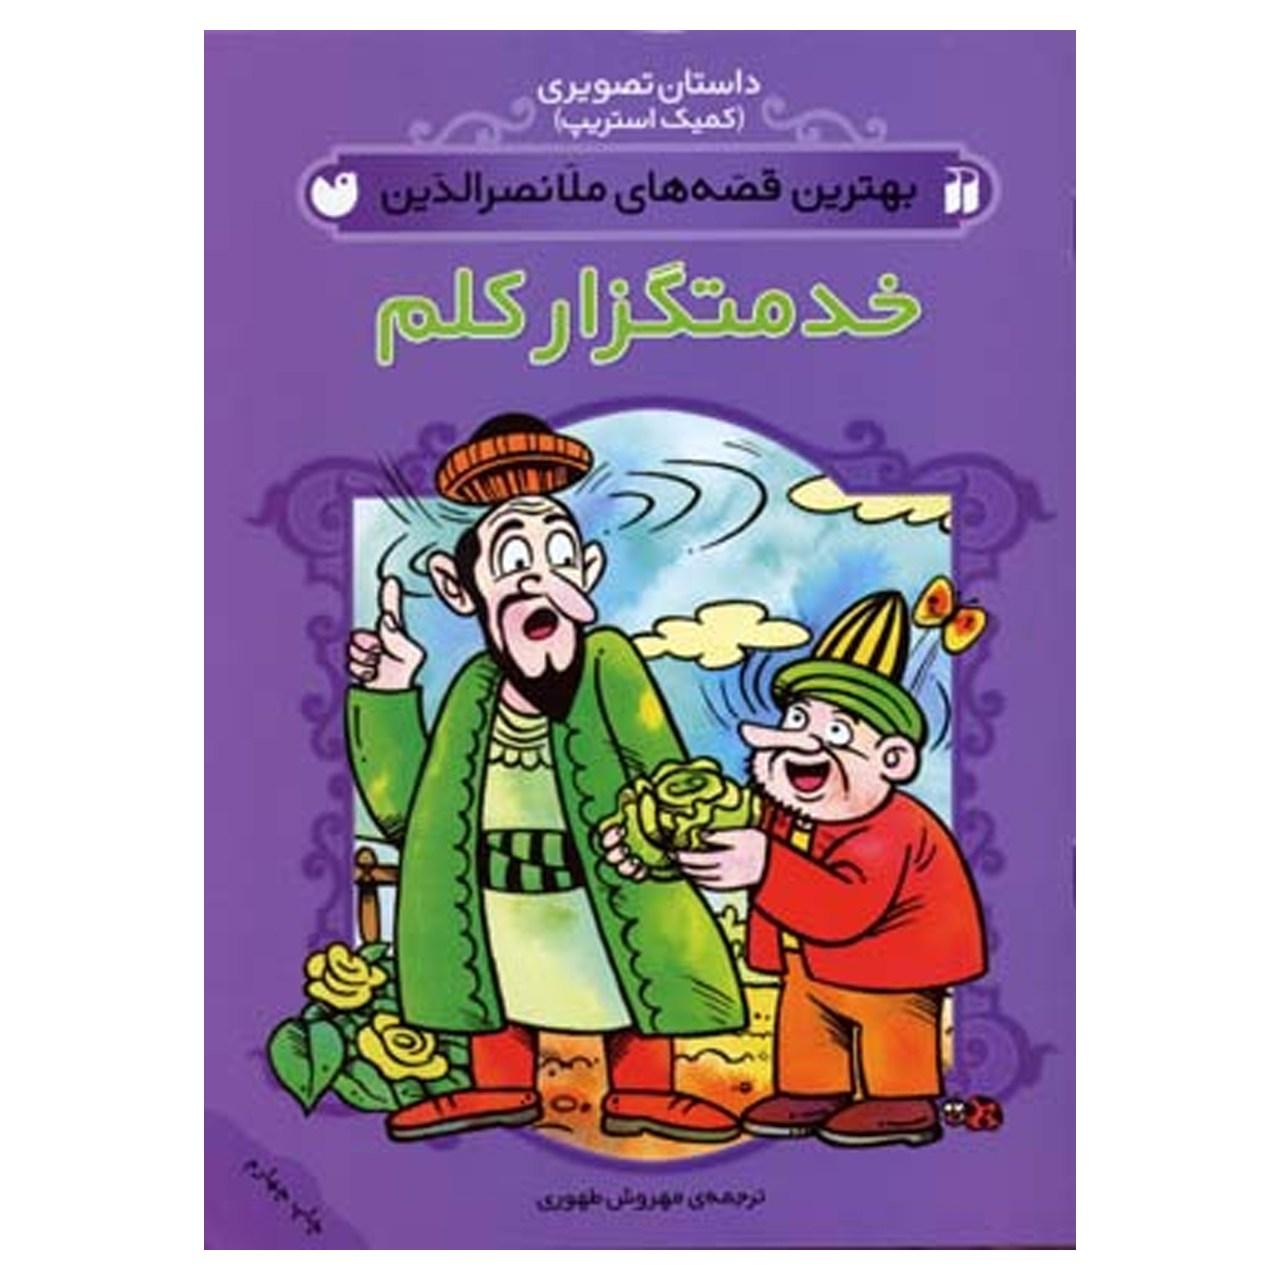 کتاب بهترین قصه ملانصرالدین خدمتگزار کلم اثر مهروش طهوری